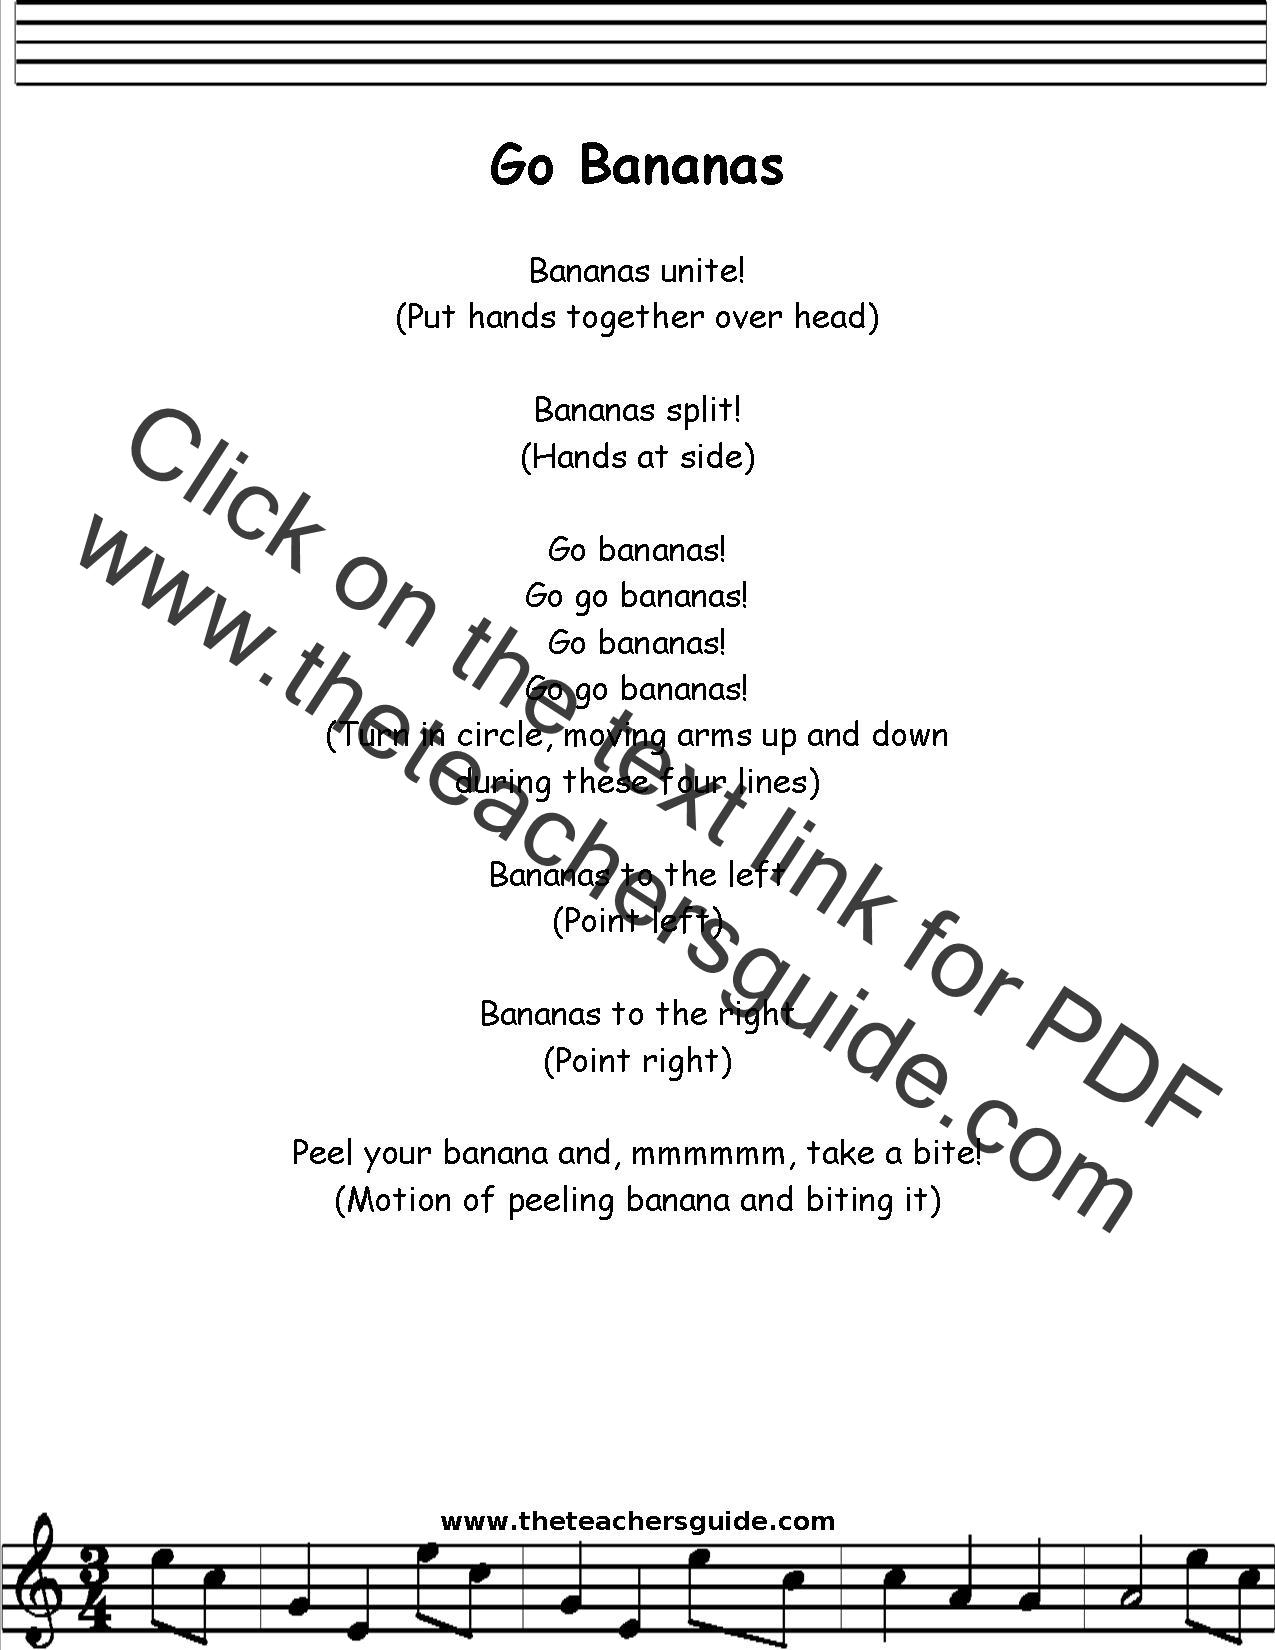 Go Bananas Lyrics Printout Midi And Video